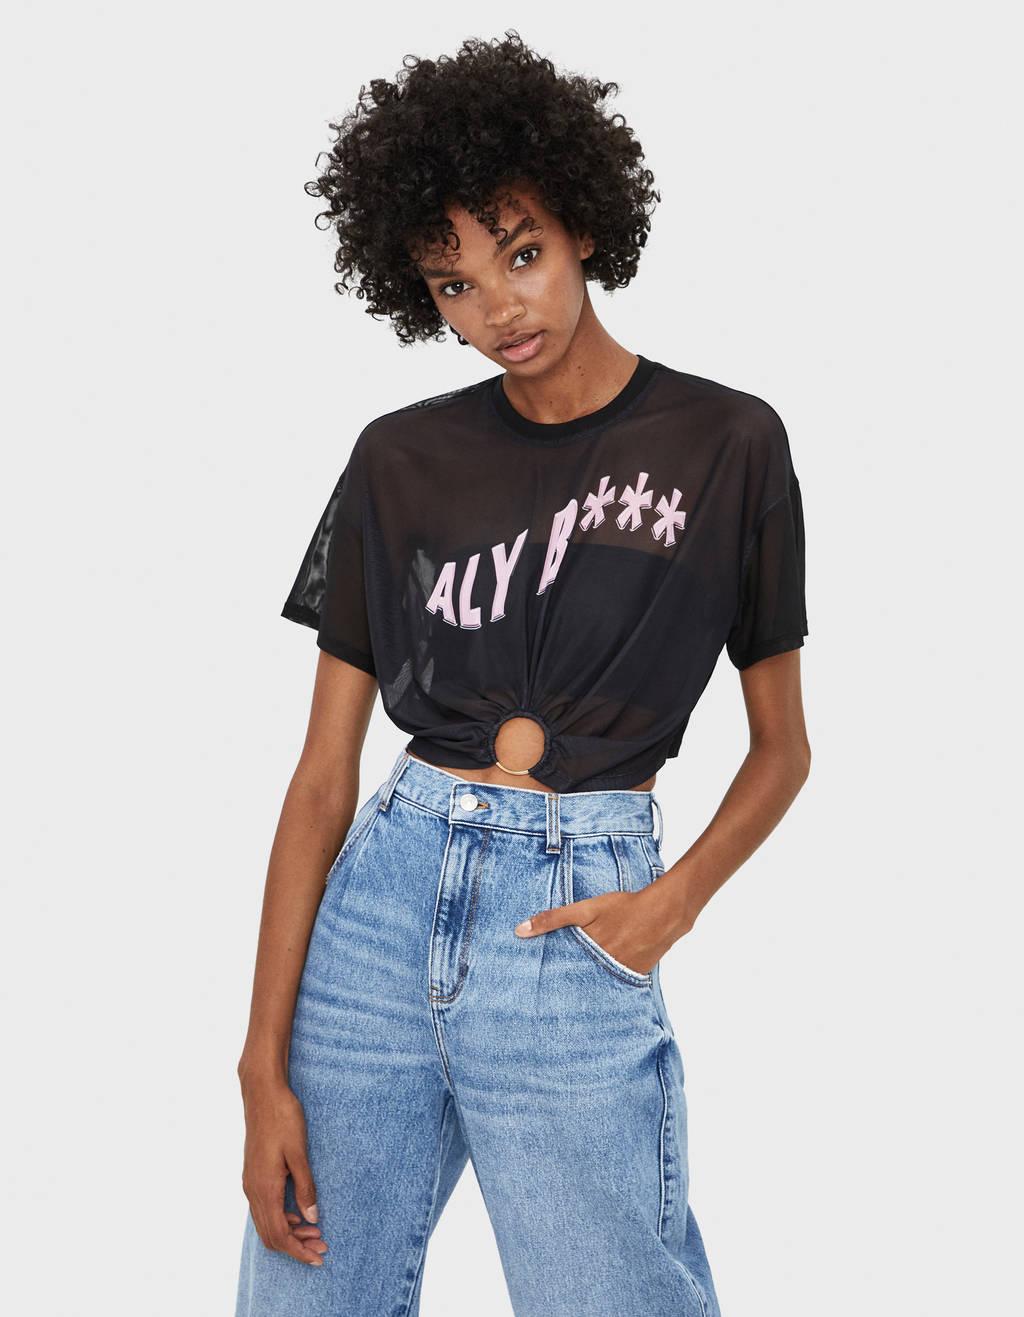 Tule t-shirt Ali B